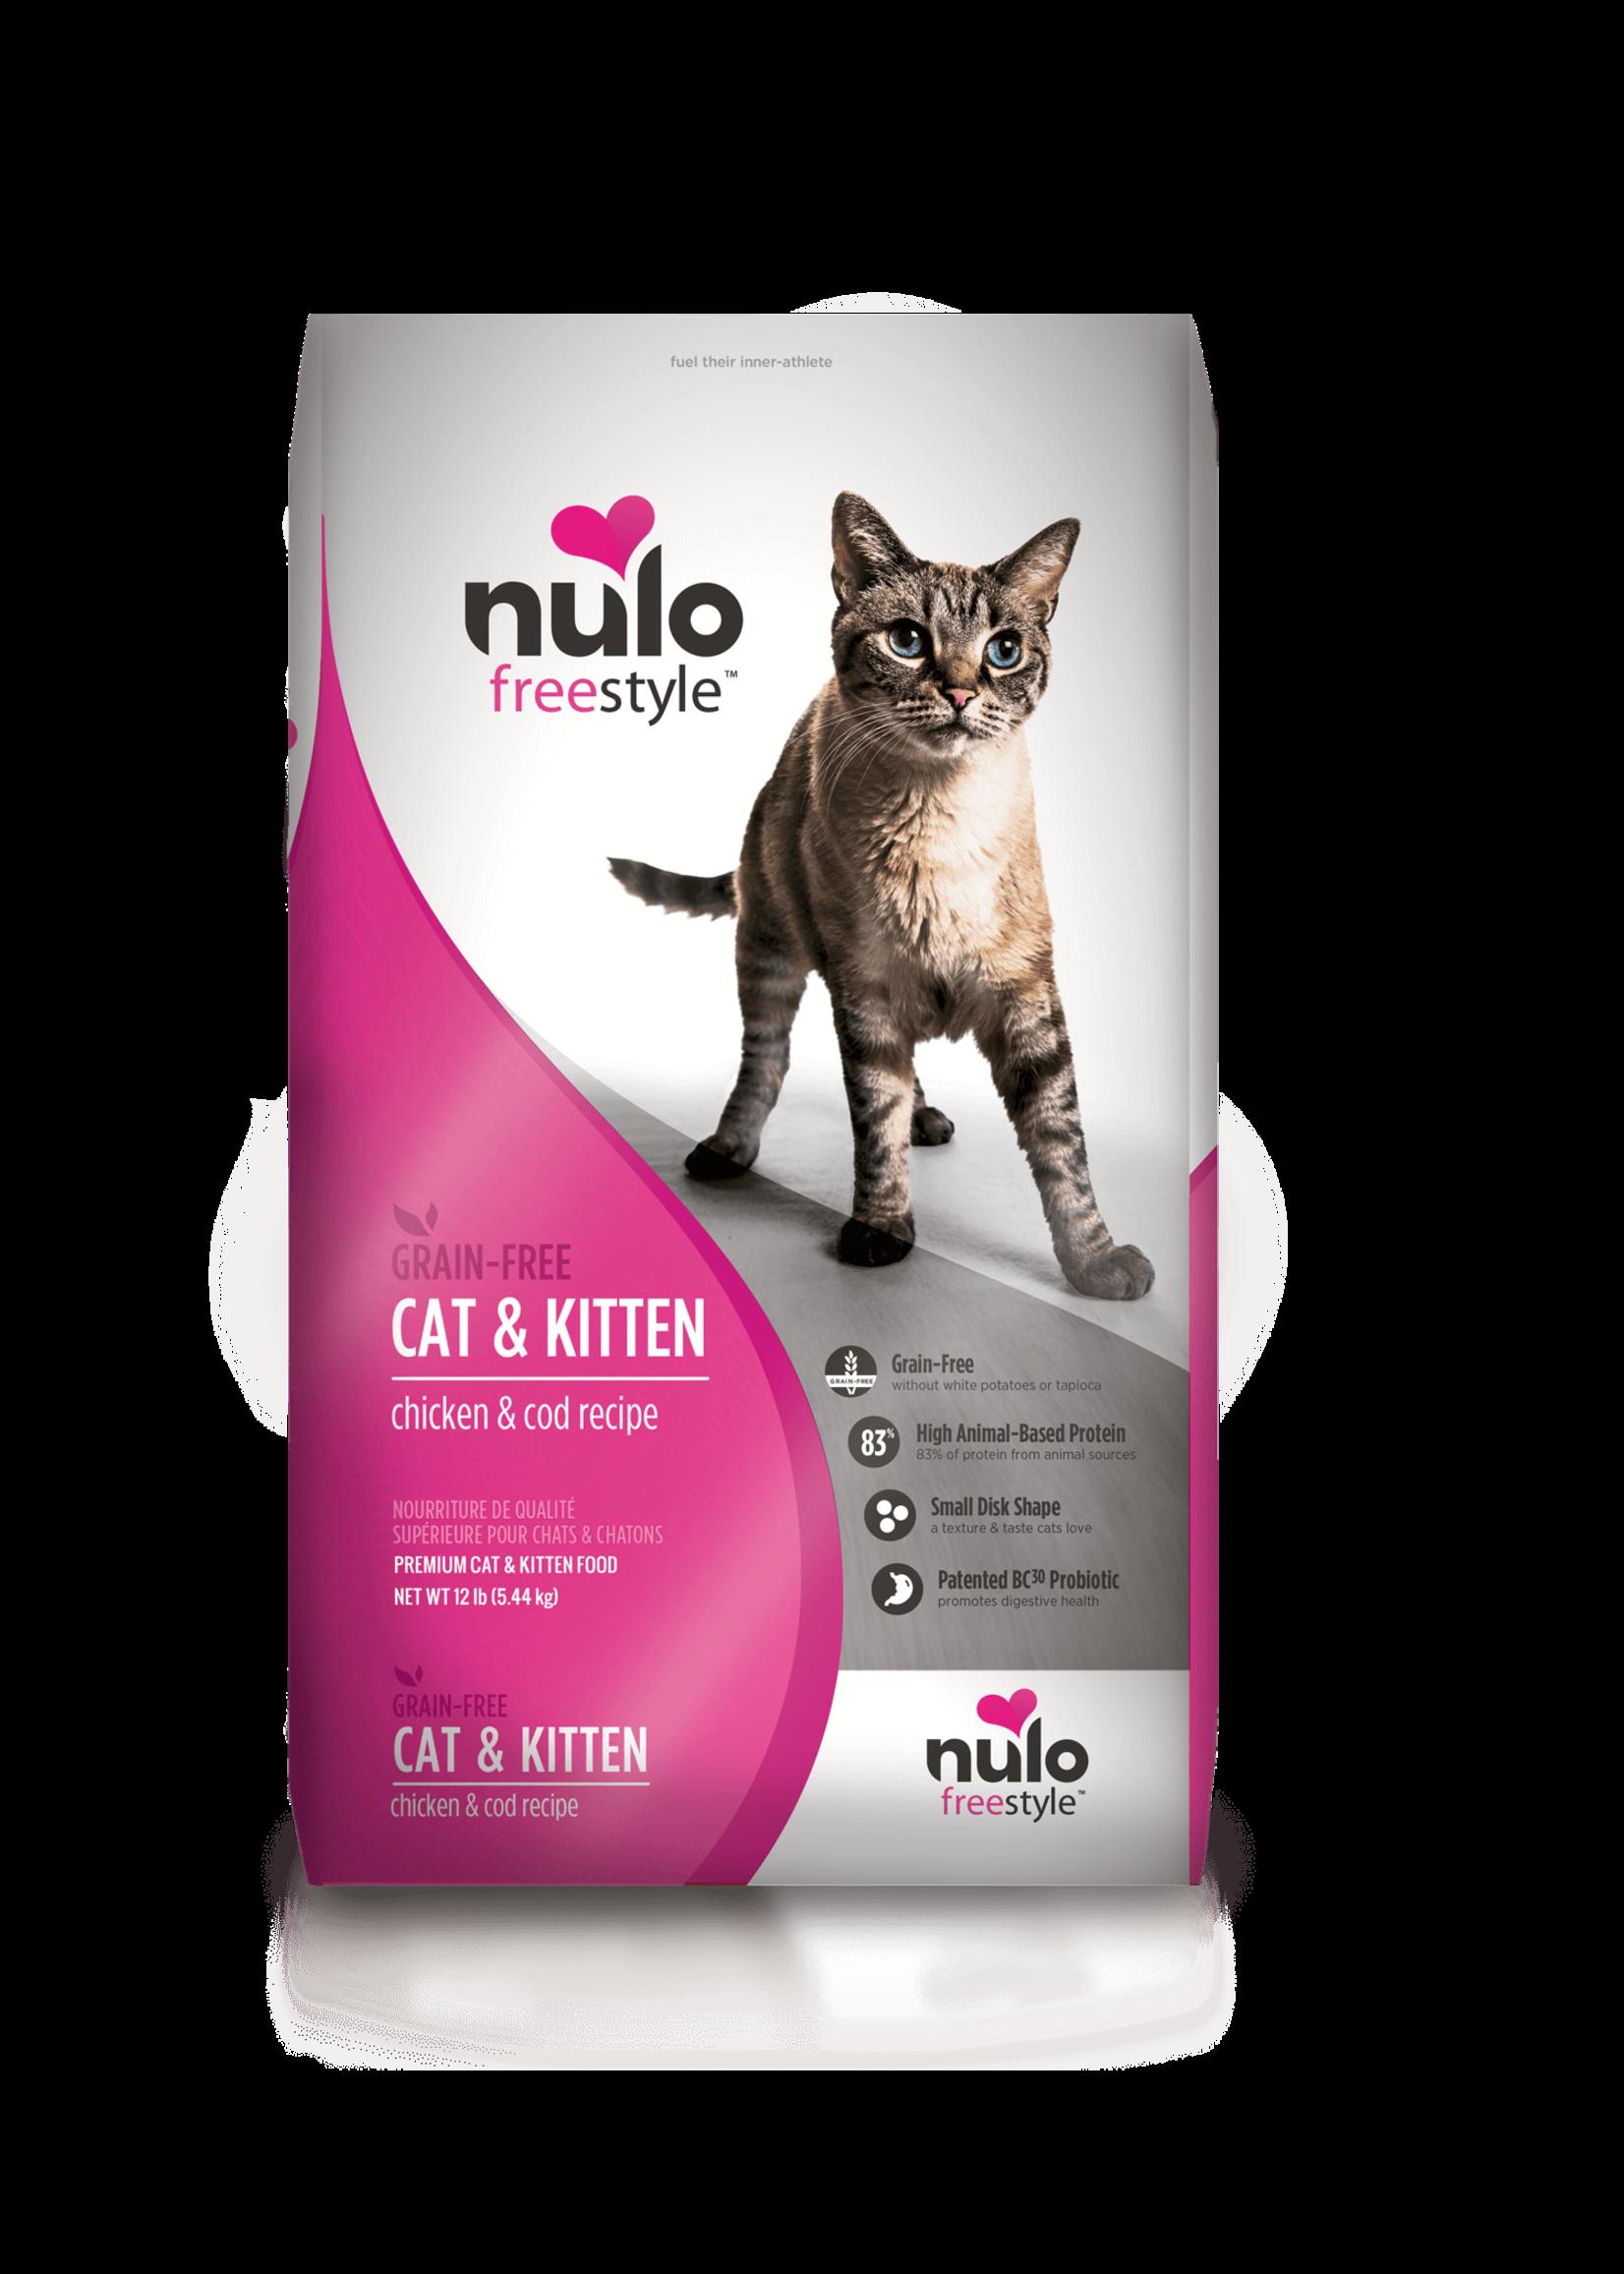 Nulo Nulo FreeStyle Grain Free Cat & Kitten Food Chicken & Cod, 12lb Bag